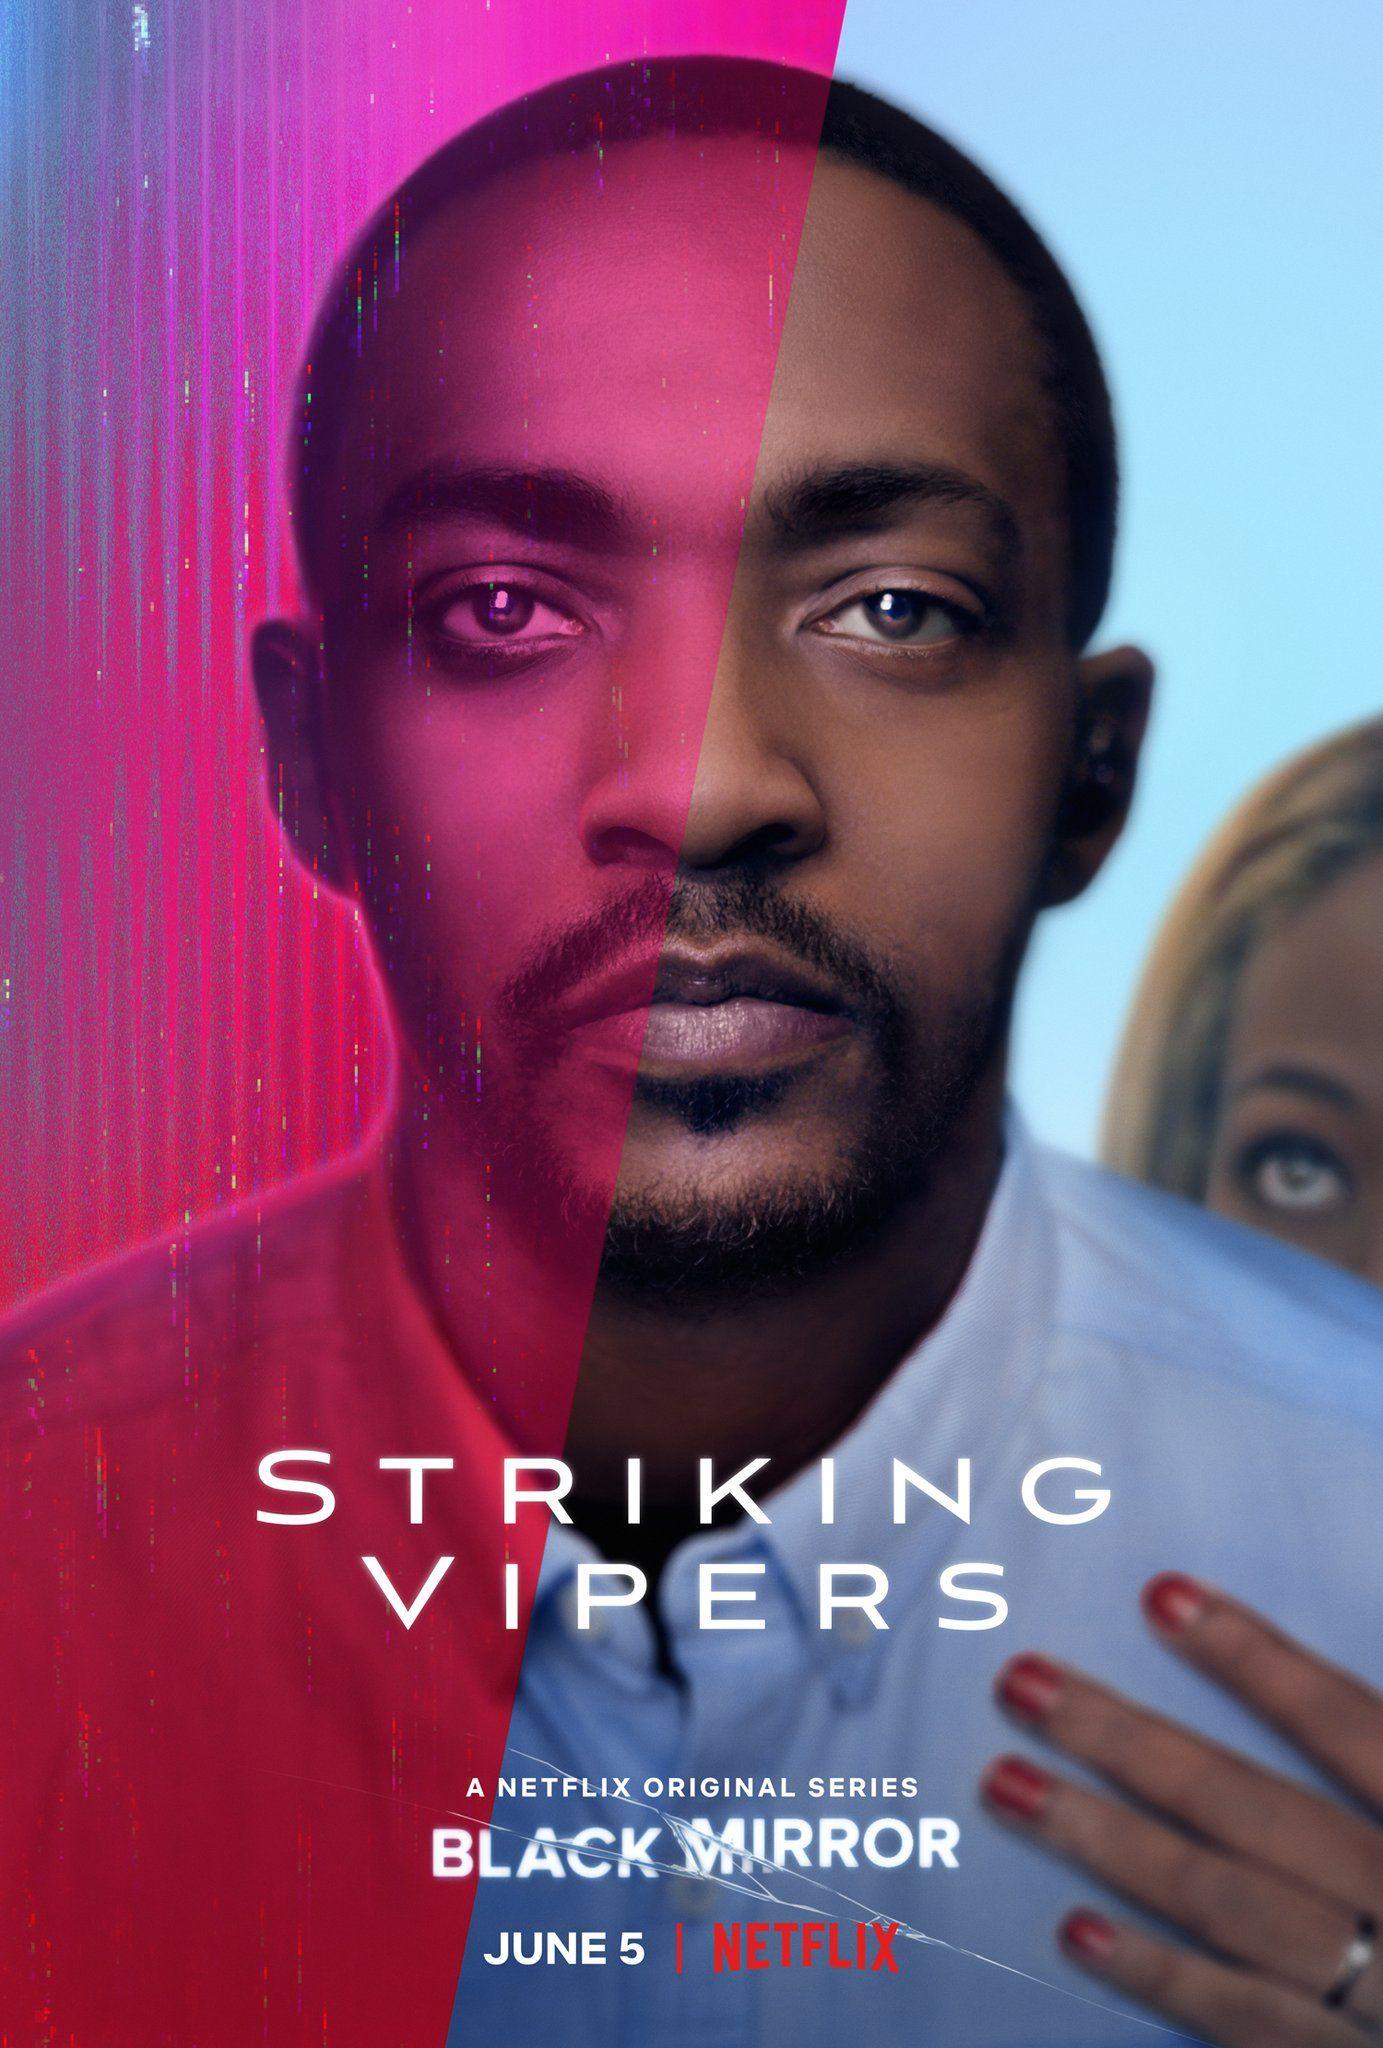 White Christmas Black Mirror Review.Black Mirror Season 5 Review Netflix S Series Loses Its